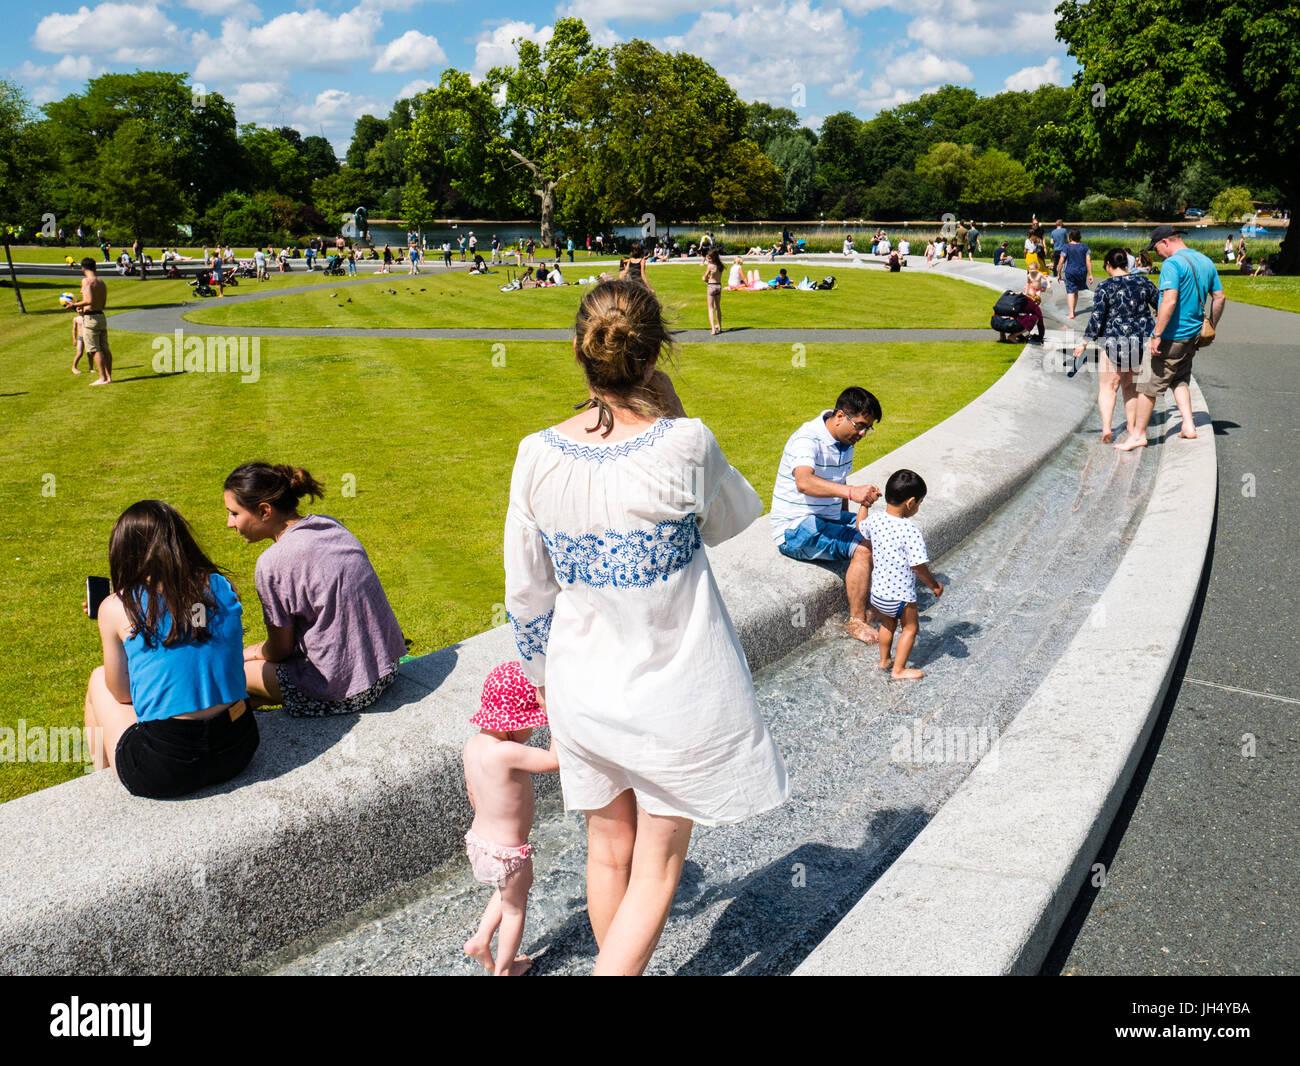 People Enjoying Sunshine, Princess Diana Memorial Fountain, Hyde Park, London, England - Stock Image